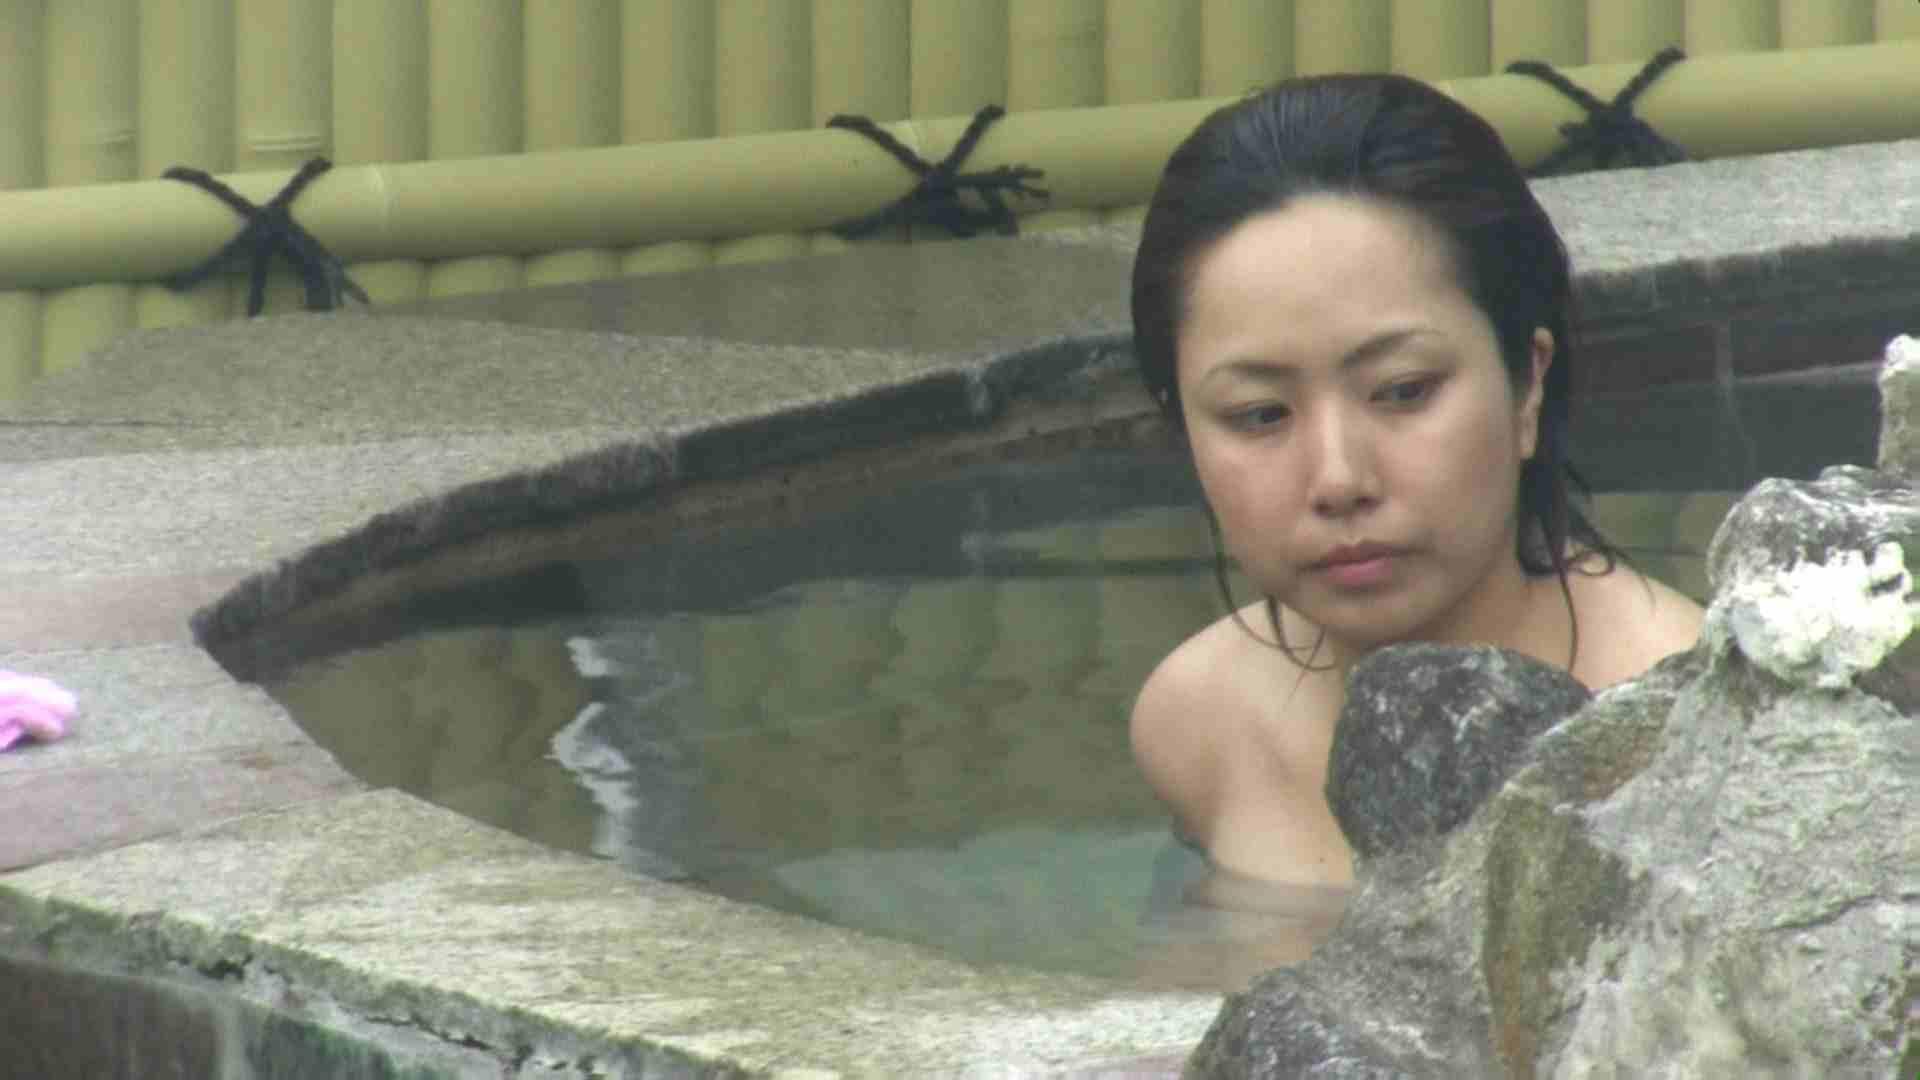 Aquaな露天風呂Vol.604 露天風呂編  89PIX 32